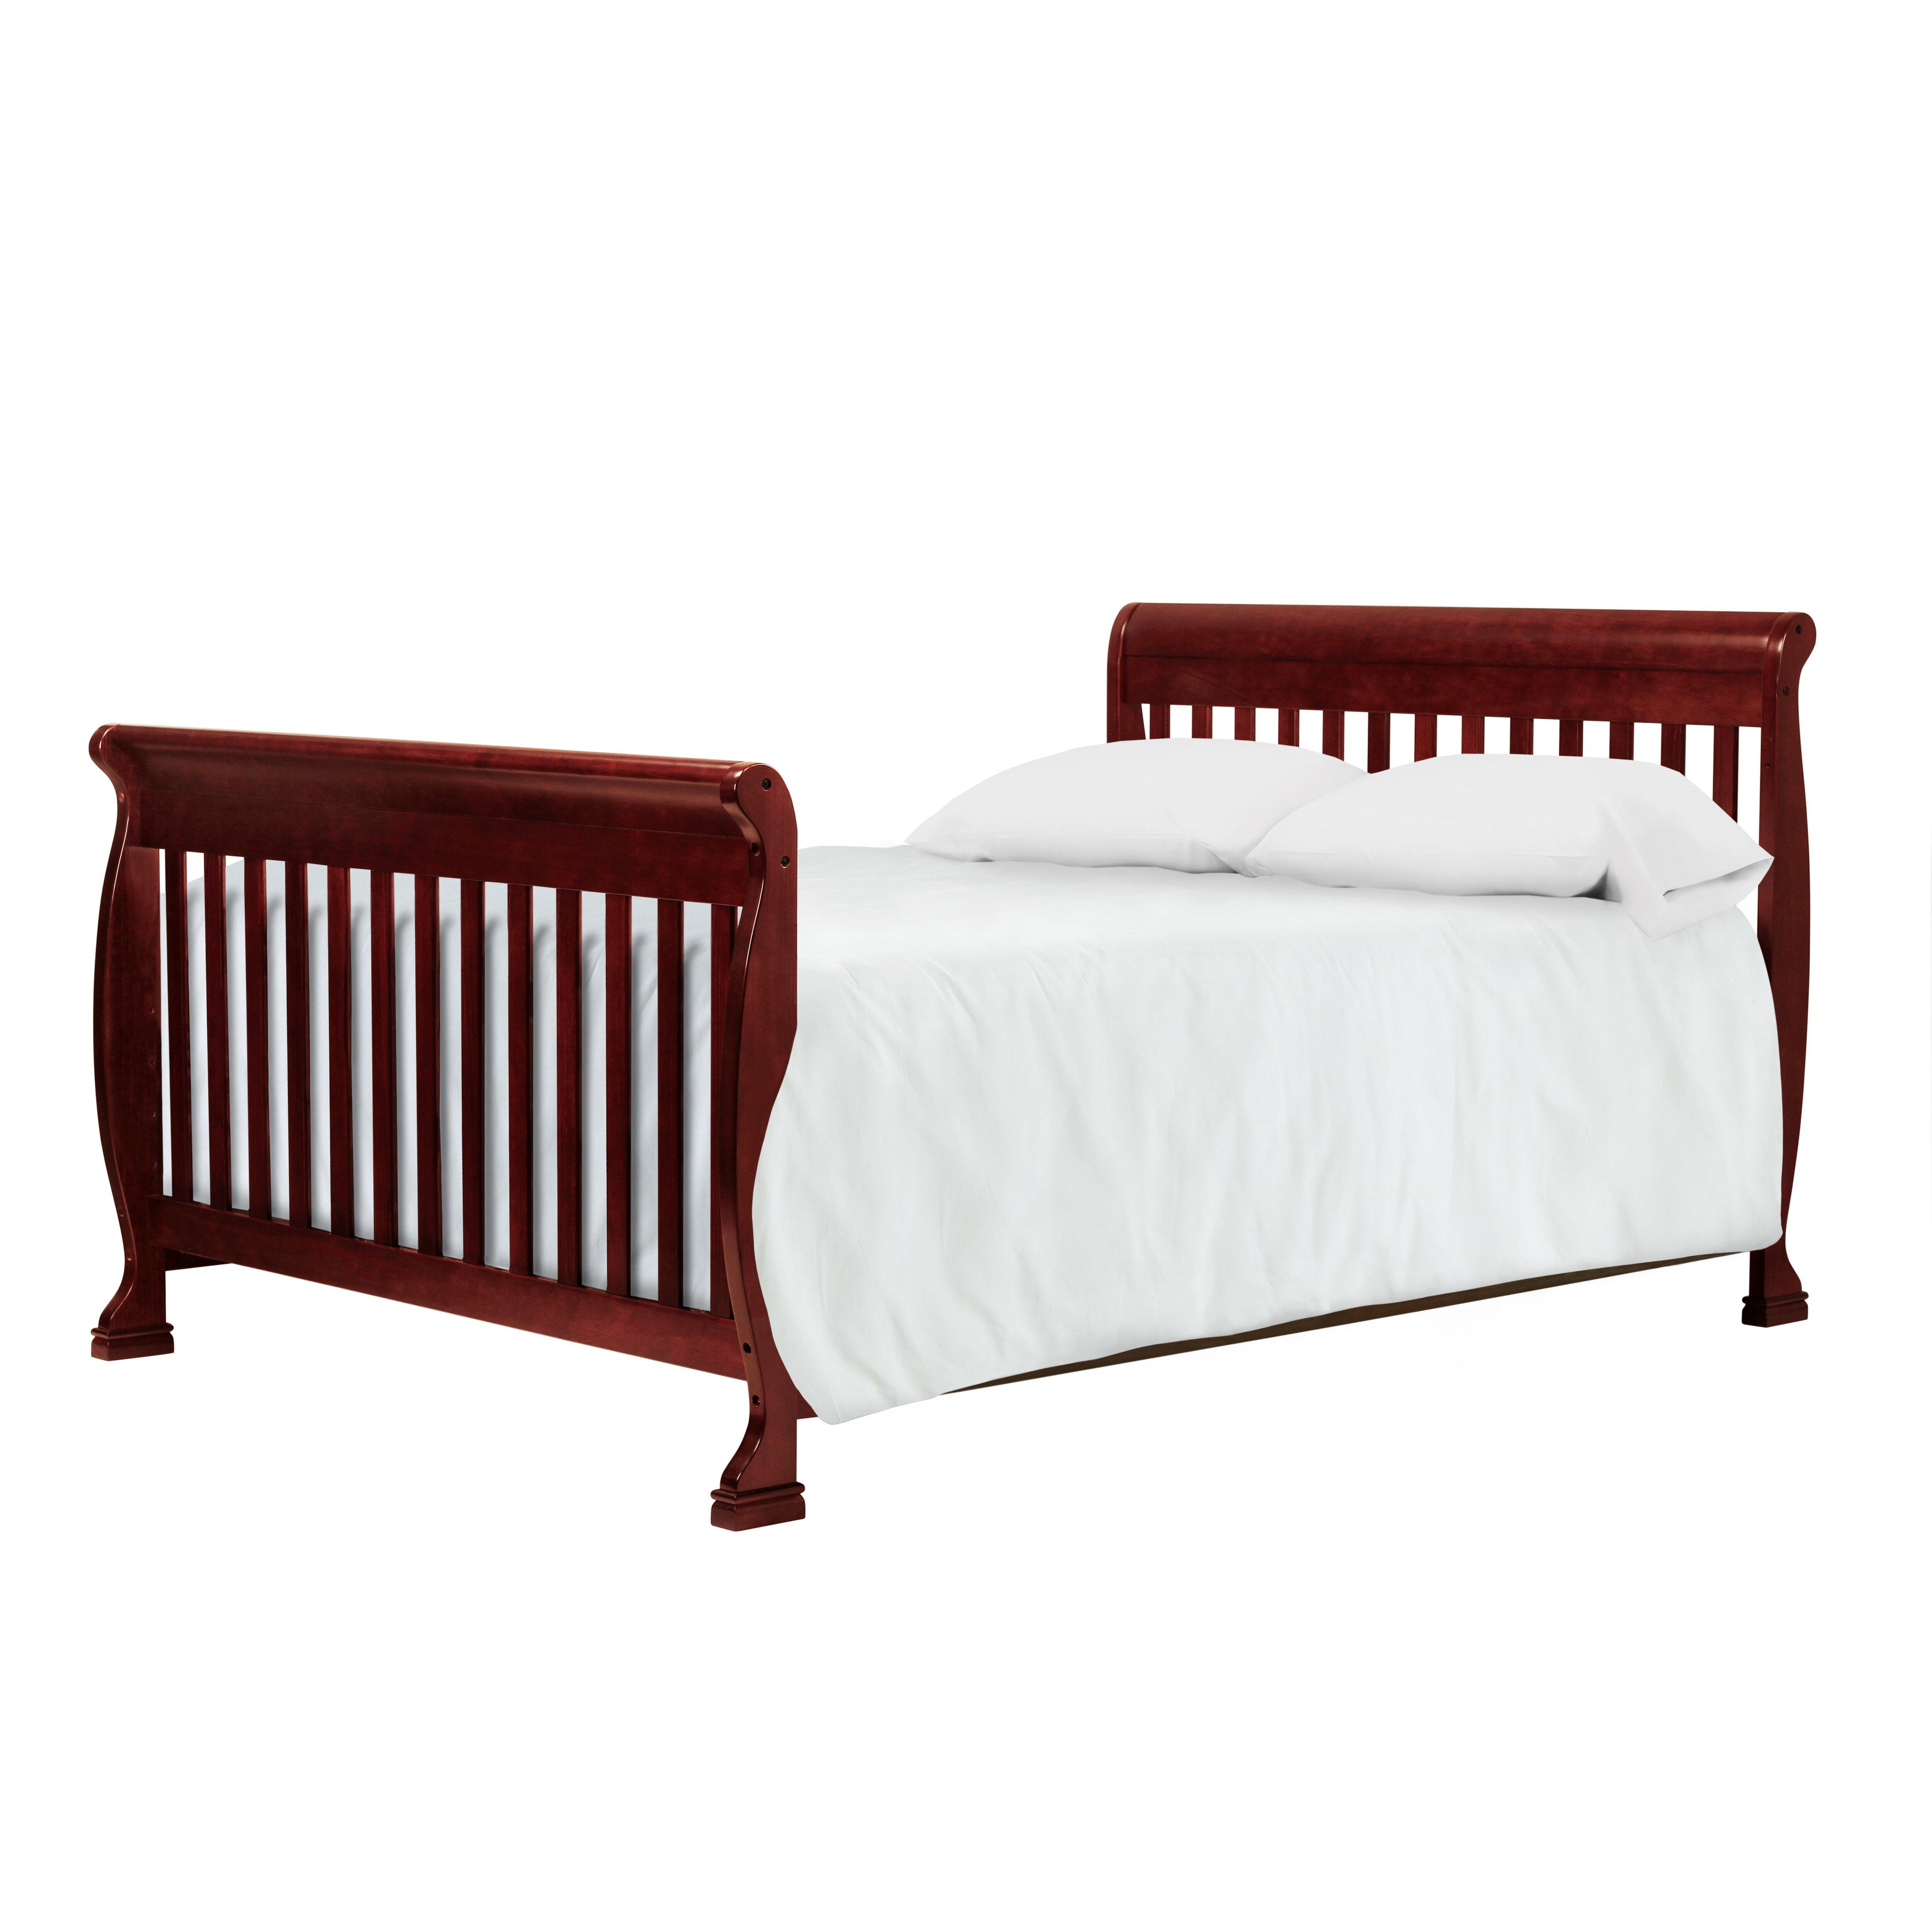 DaVinci Kalani 4-in-1 Convertible Crib & Reviews   Wayfair